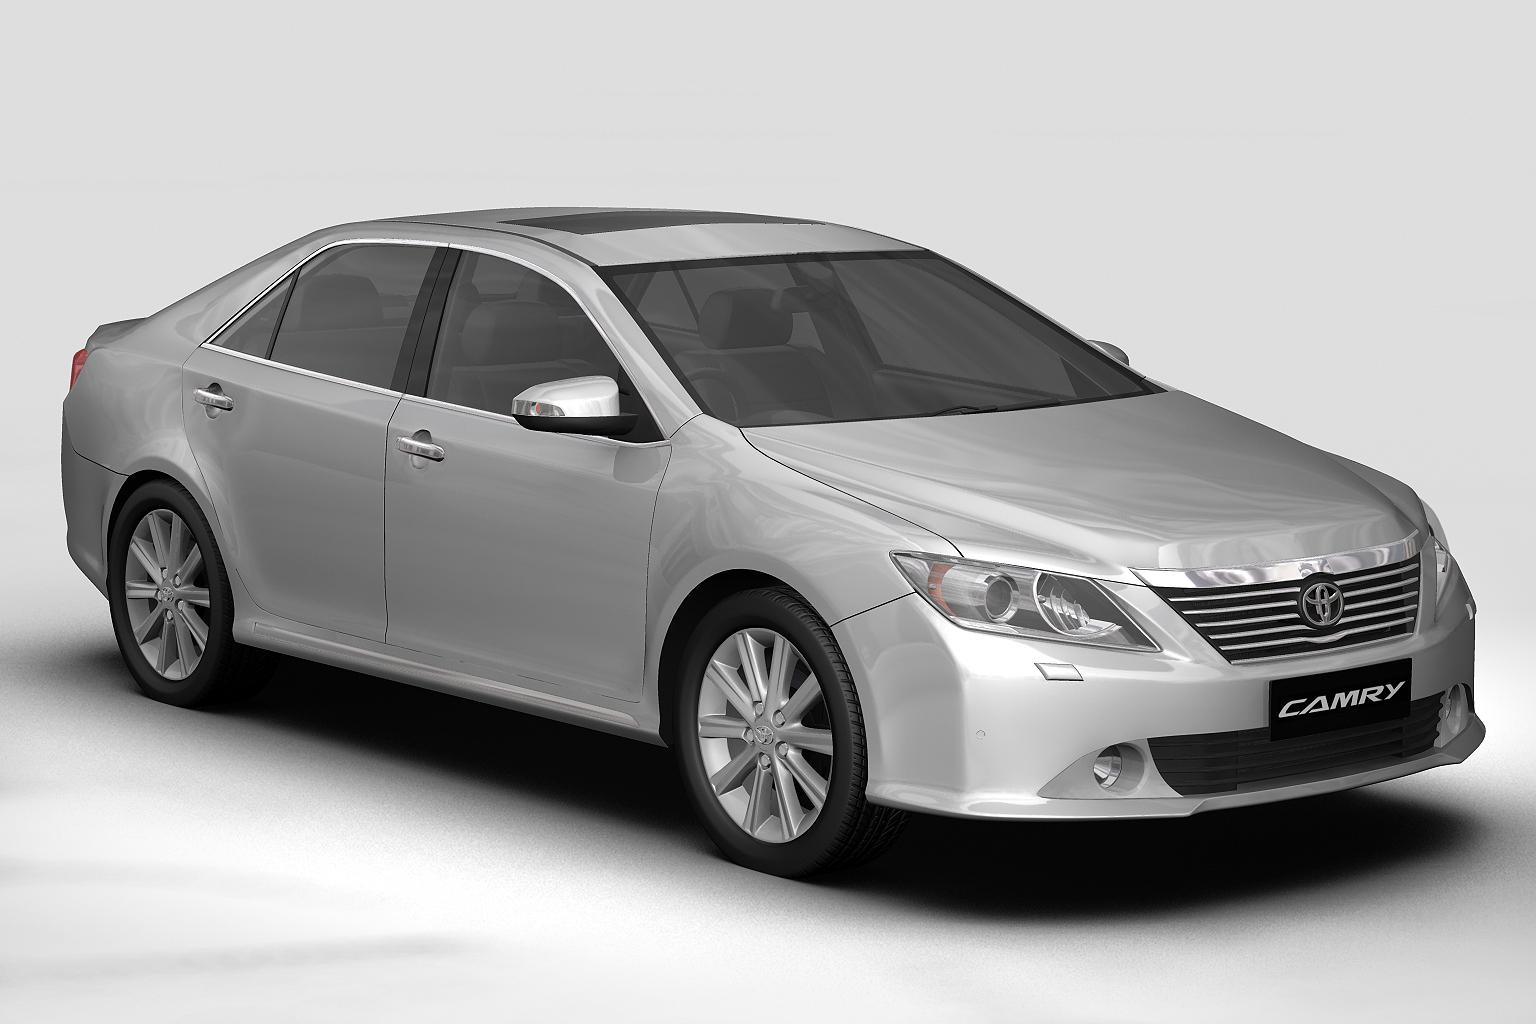 Hyundai Elantra 2012 Model >> 2012 Toyota Camry (Asian) 3D Model – Buy 2012 Toyota Camry (Asian) 3D Model | FlatPyramid